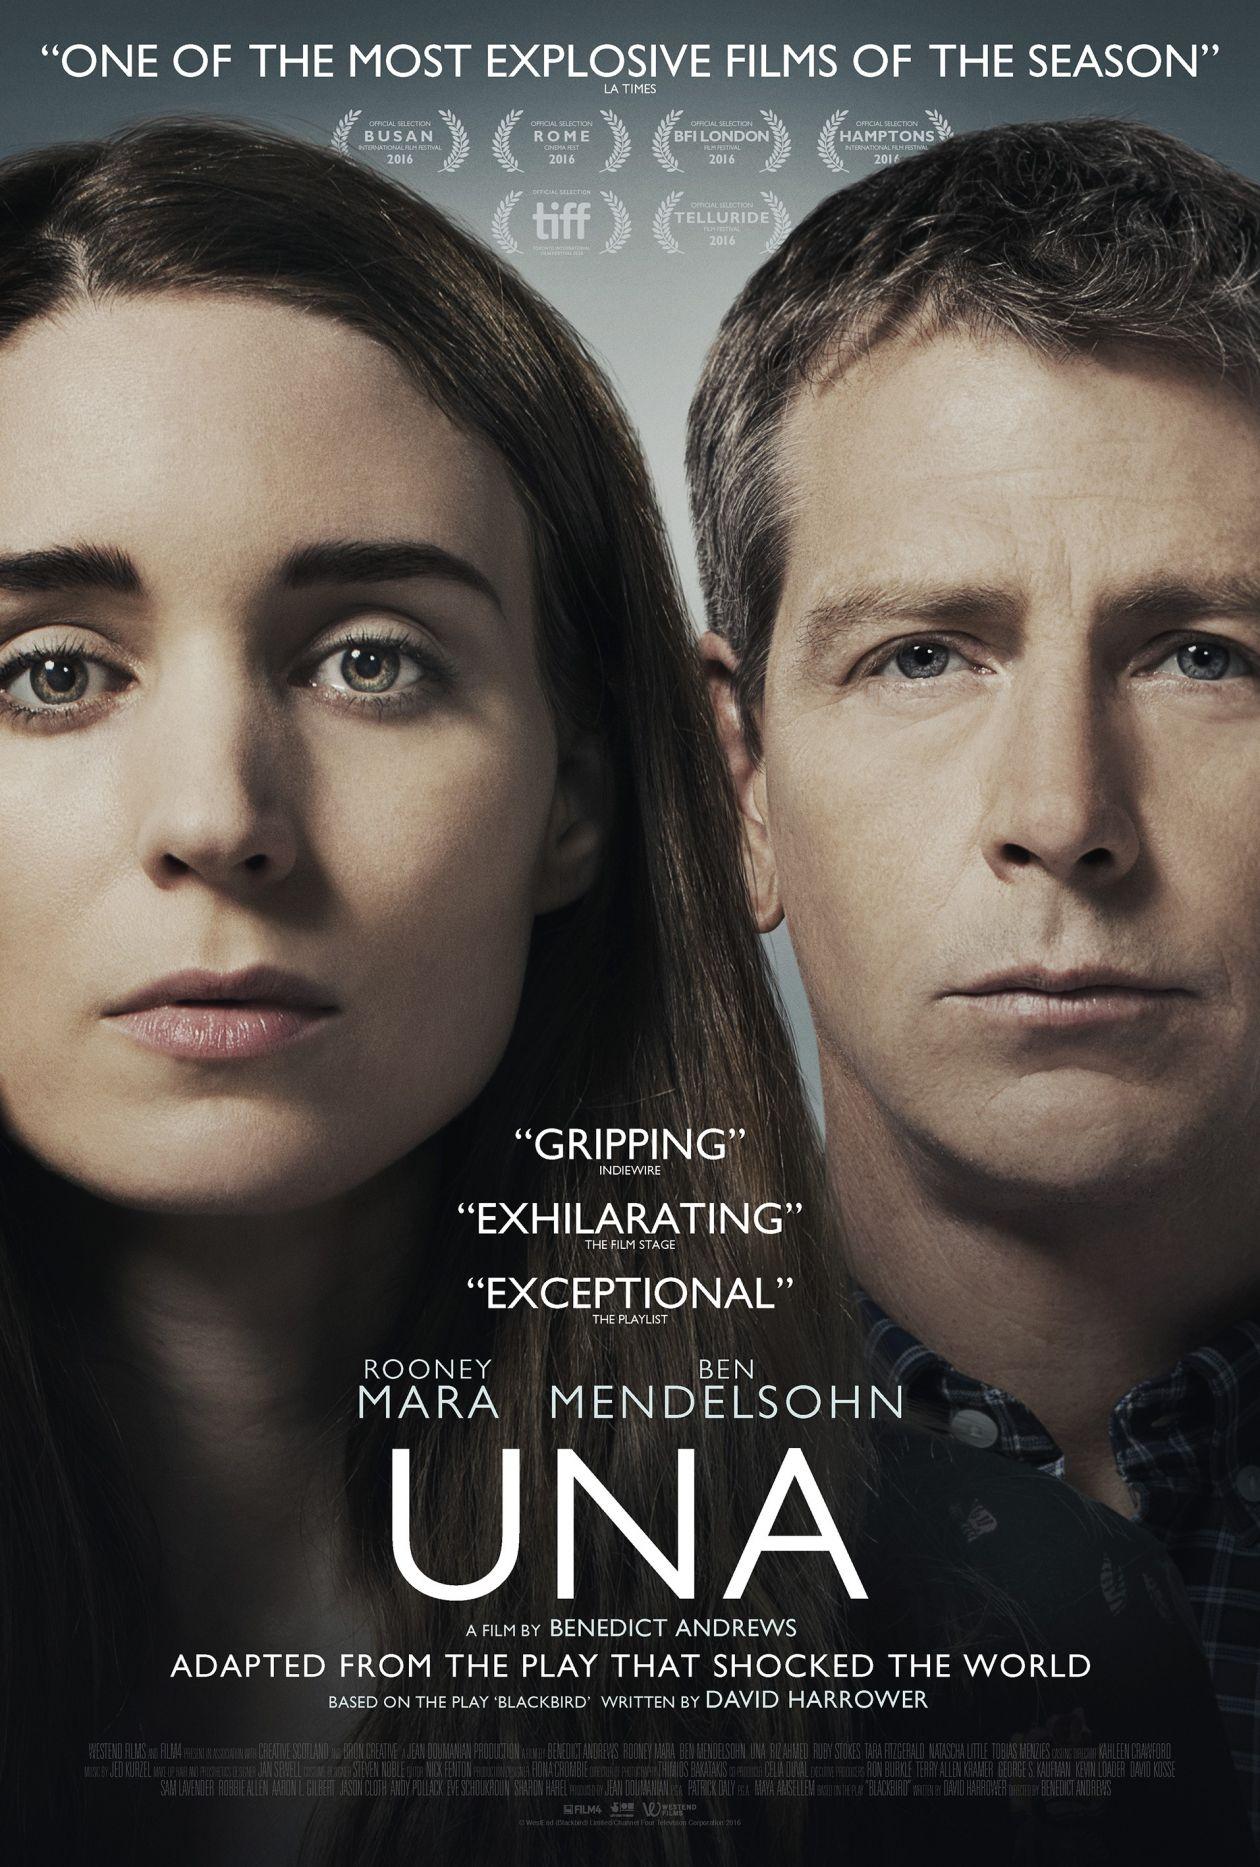 Rooney Mara actress | UNA | Benedict Andrews 2016 Movie Poster Affiche film